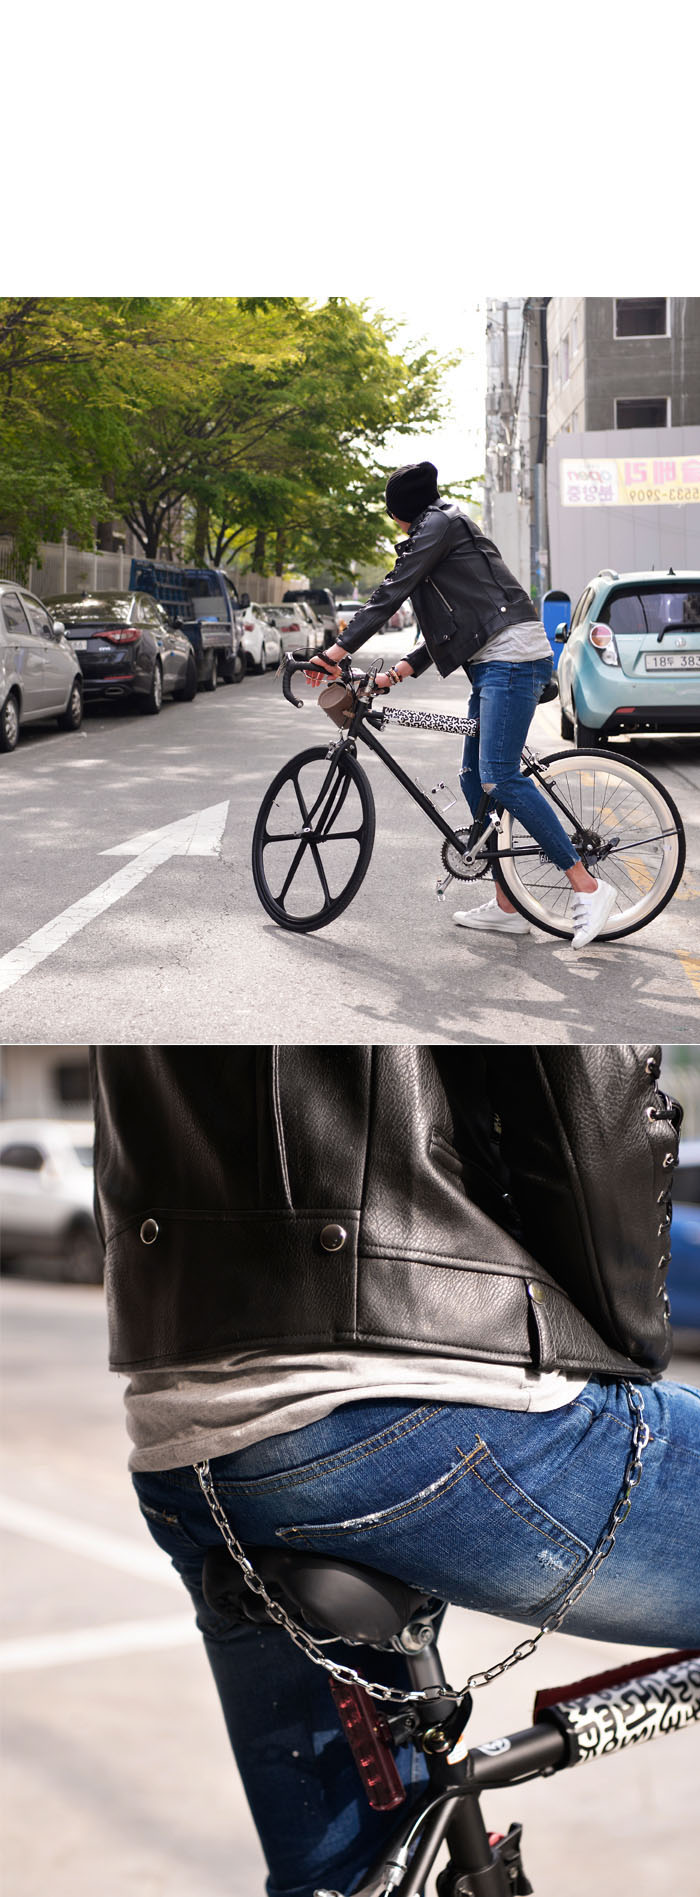 Sales Bottoms Last 1 Sharp Knife Cut Ankle Biker